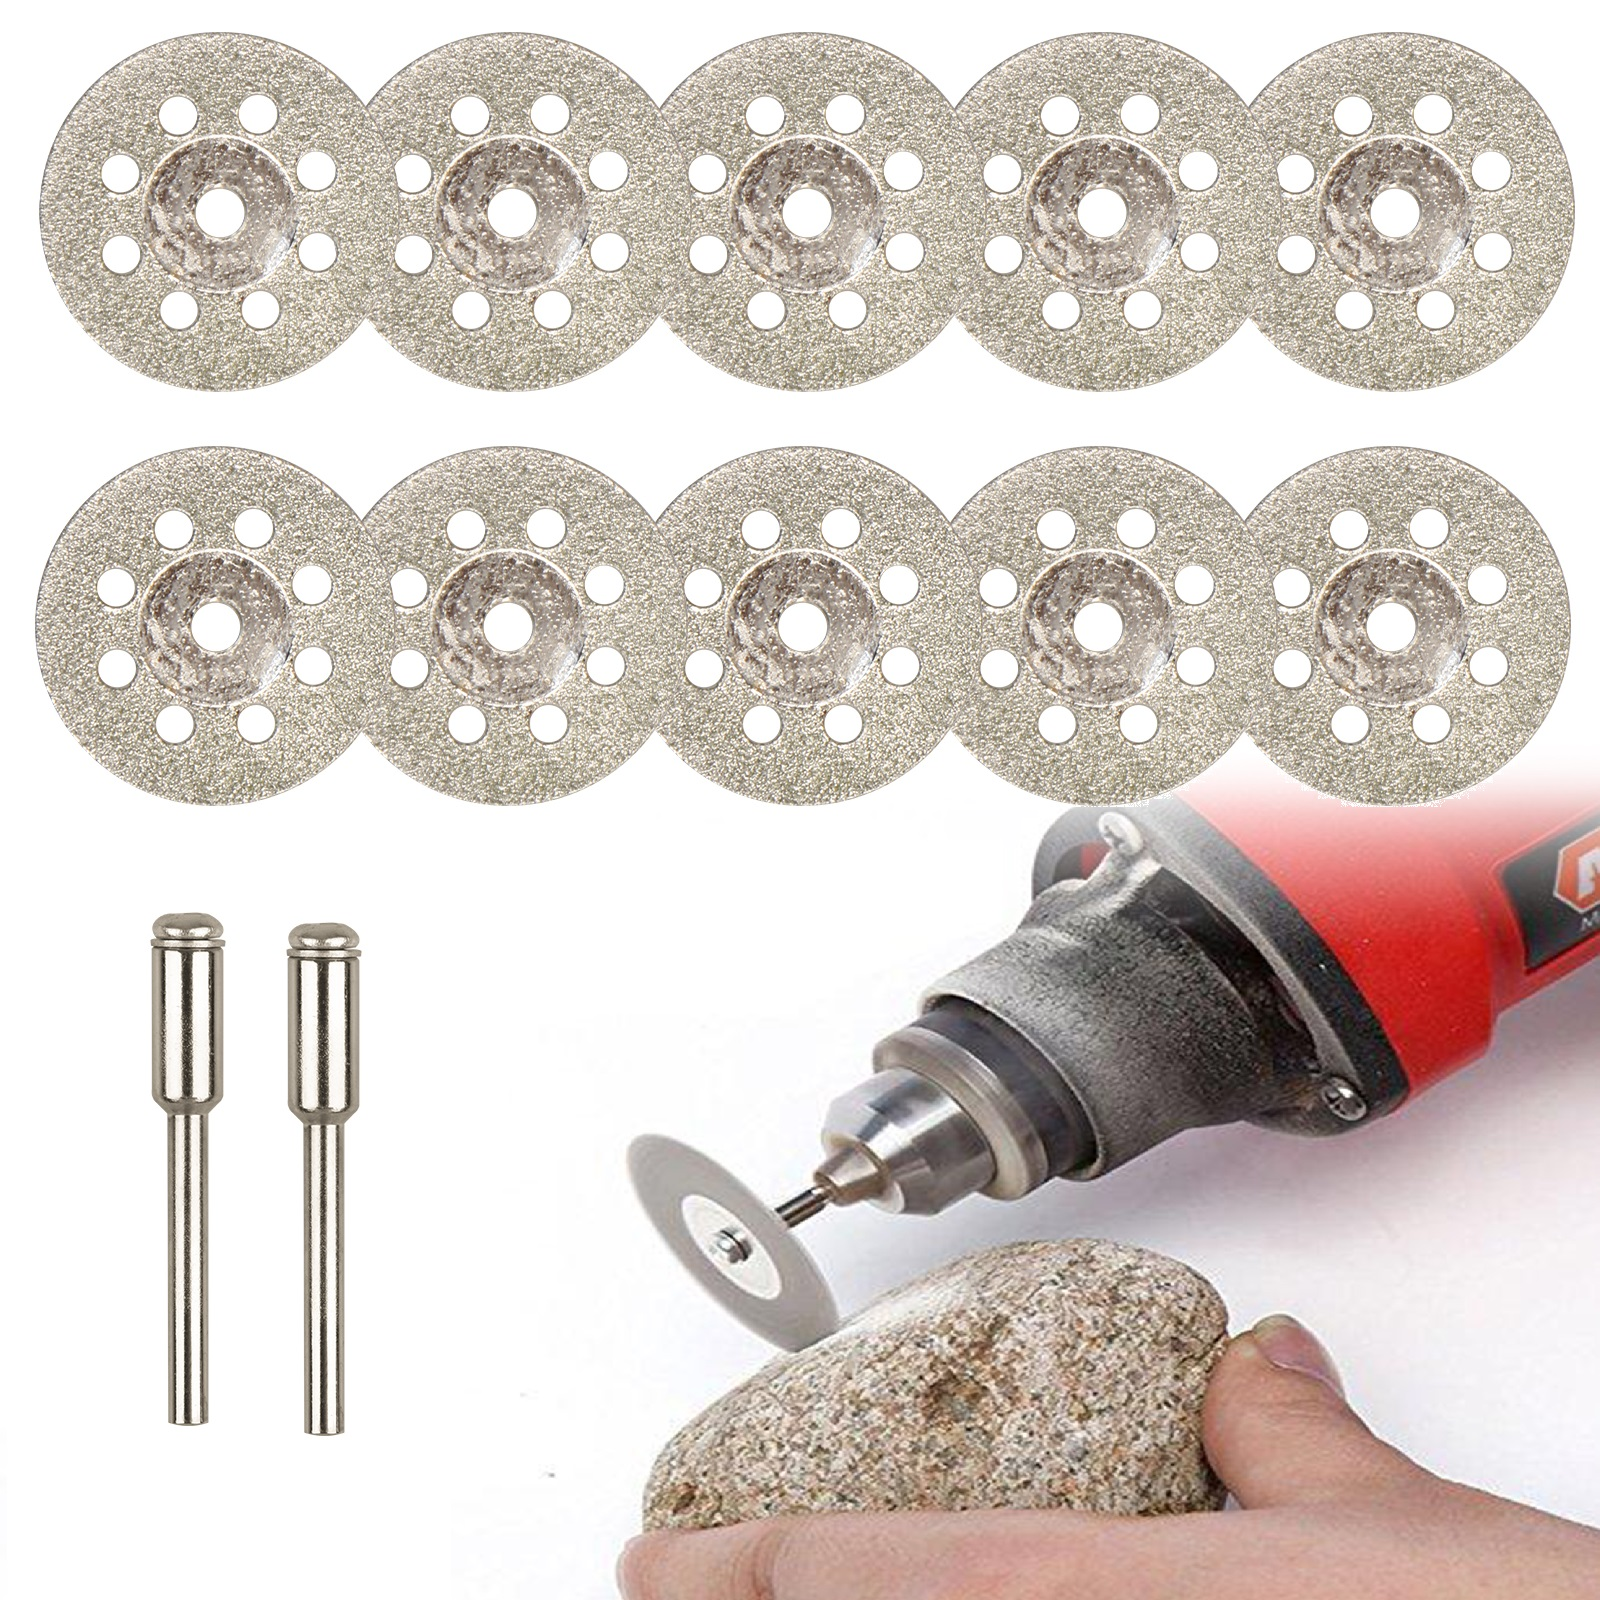 dremel diamond tile cutting wheel for tile and masonry materials us540 01